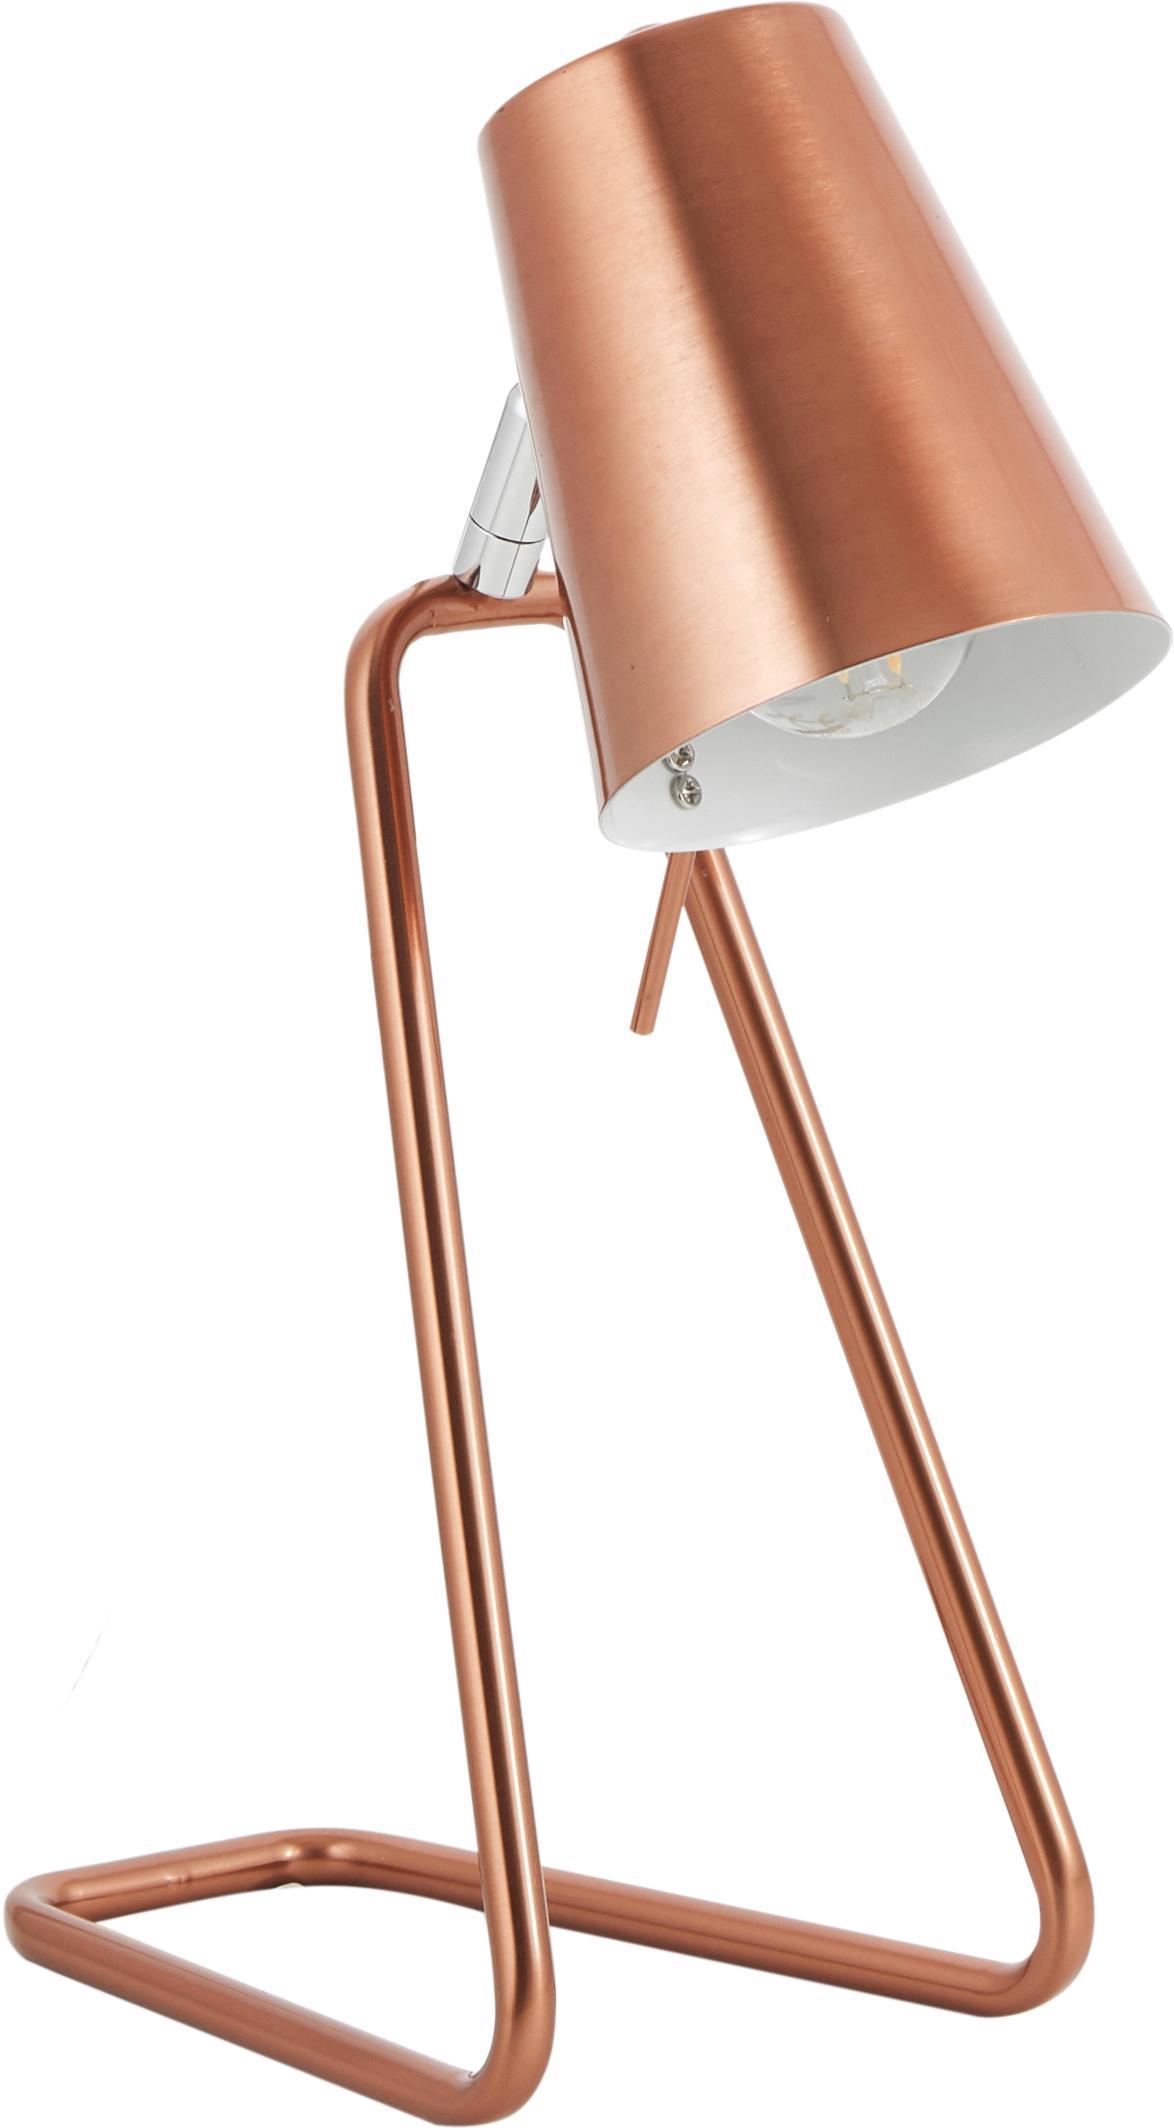 Scandi tafellamp Z, Lamp: gelakt metaal, Koperkleurig, 16 x 35 cm